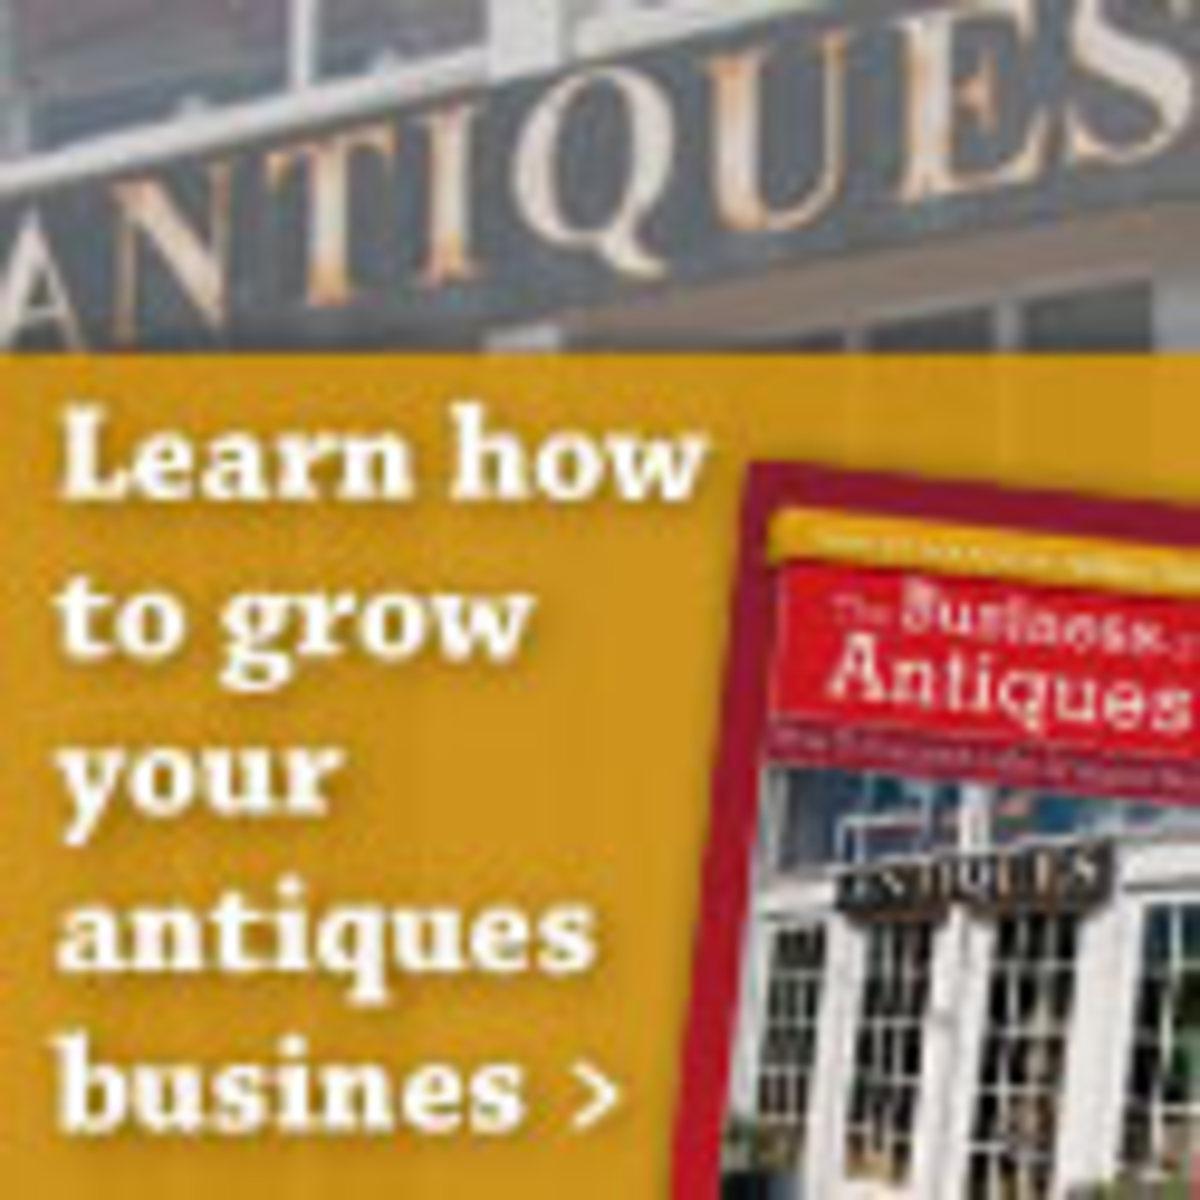 BusinessofAntiques-125x125